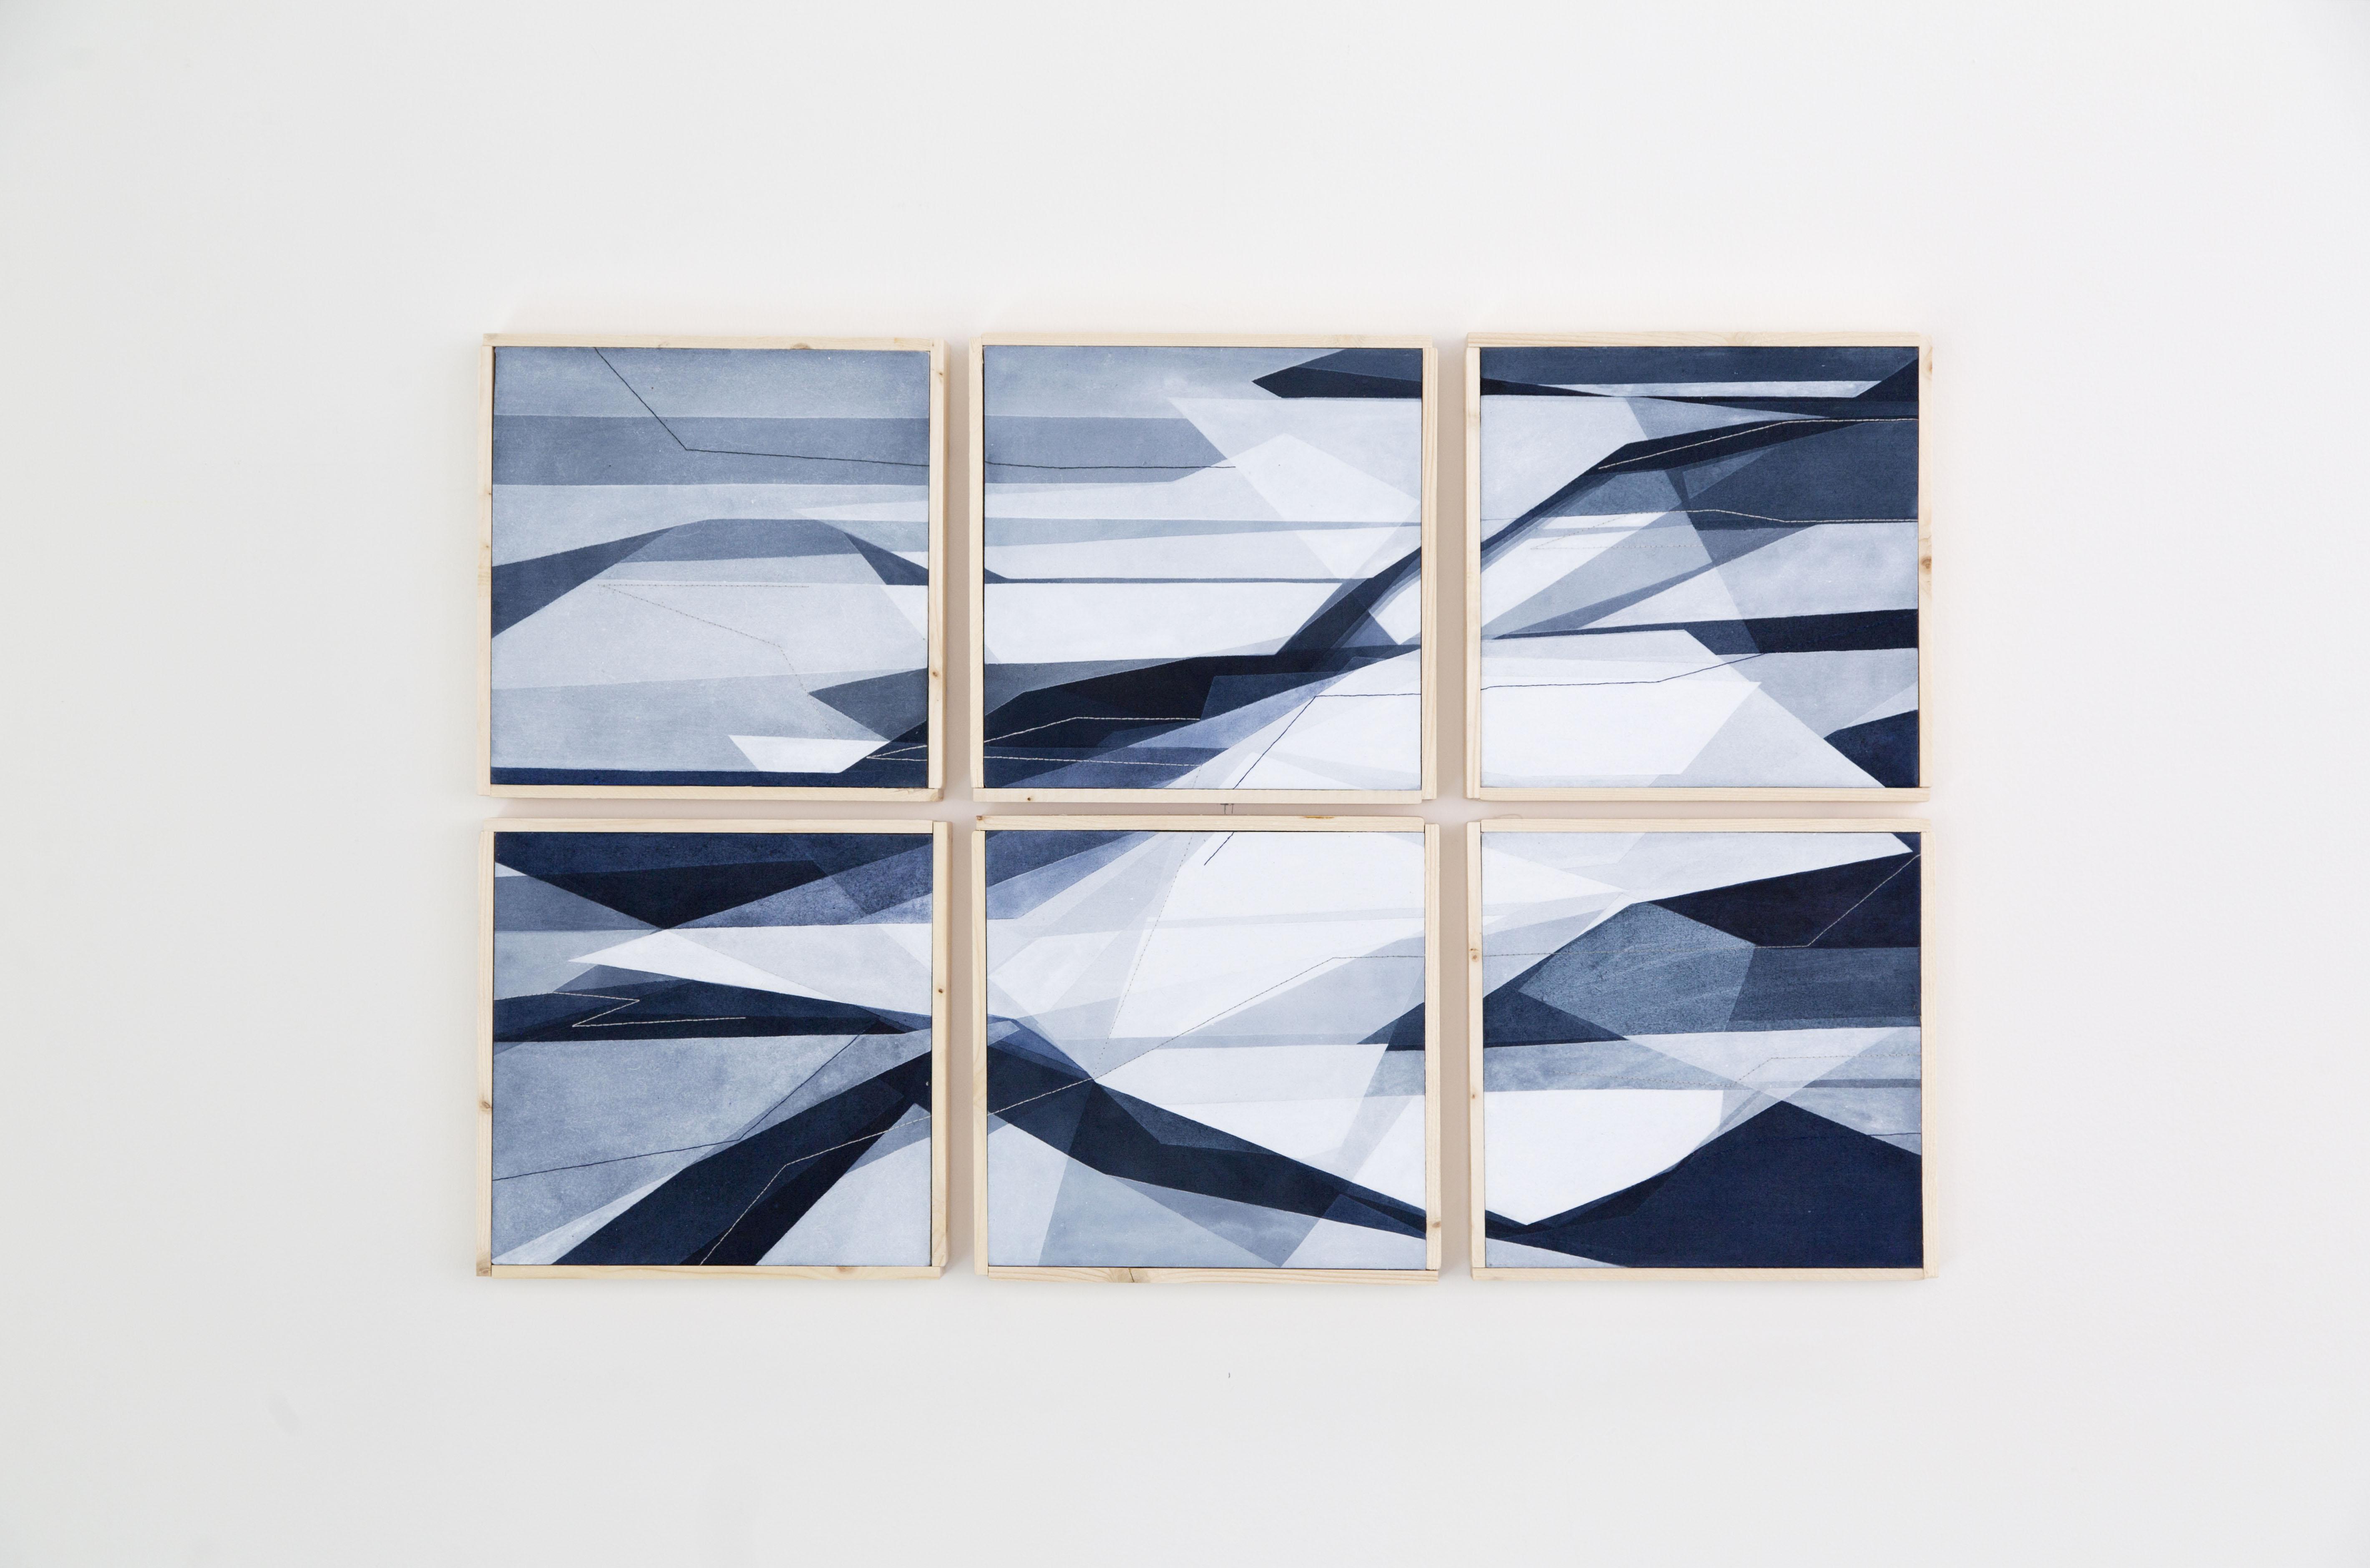 Aerea, 30x30cm Cad., 2017. Acrilico acquerellato e tessiture su tela - Watercolour on acrylic and weaving on canvas.